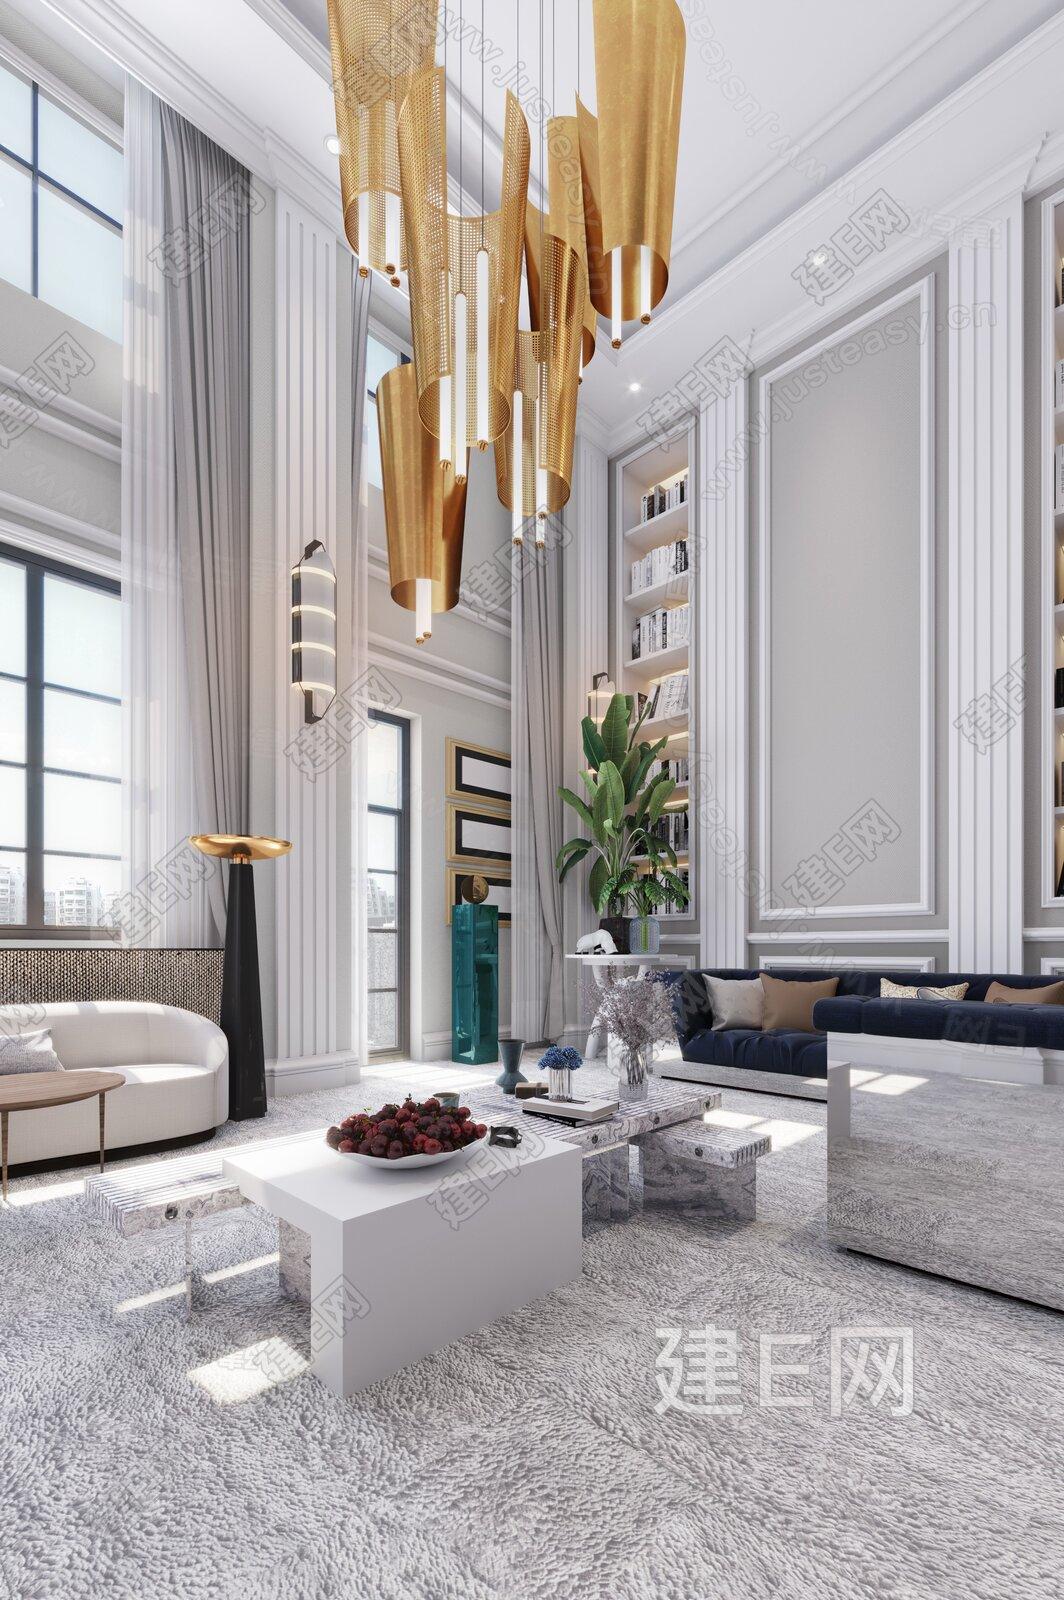 G&K桂睿诗建筑设计 现代轻奢客厅3d模型